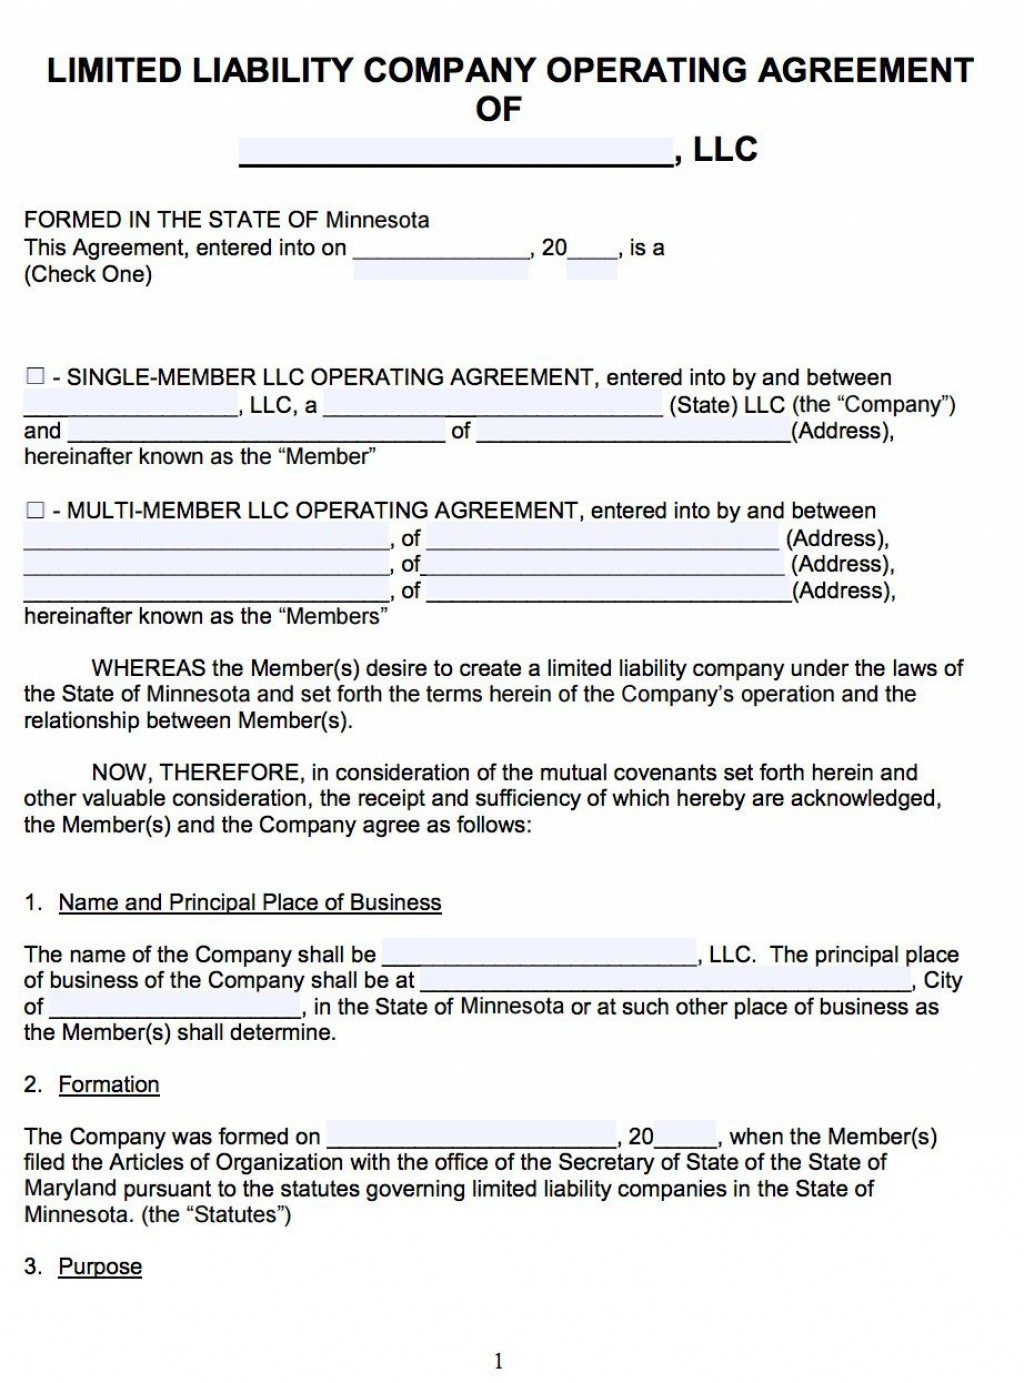 007 Awesome Llc Partnership Agreement Template High Resolution  Free OperatingLarge